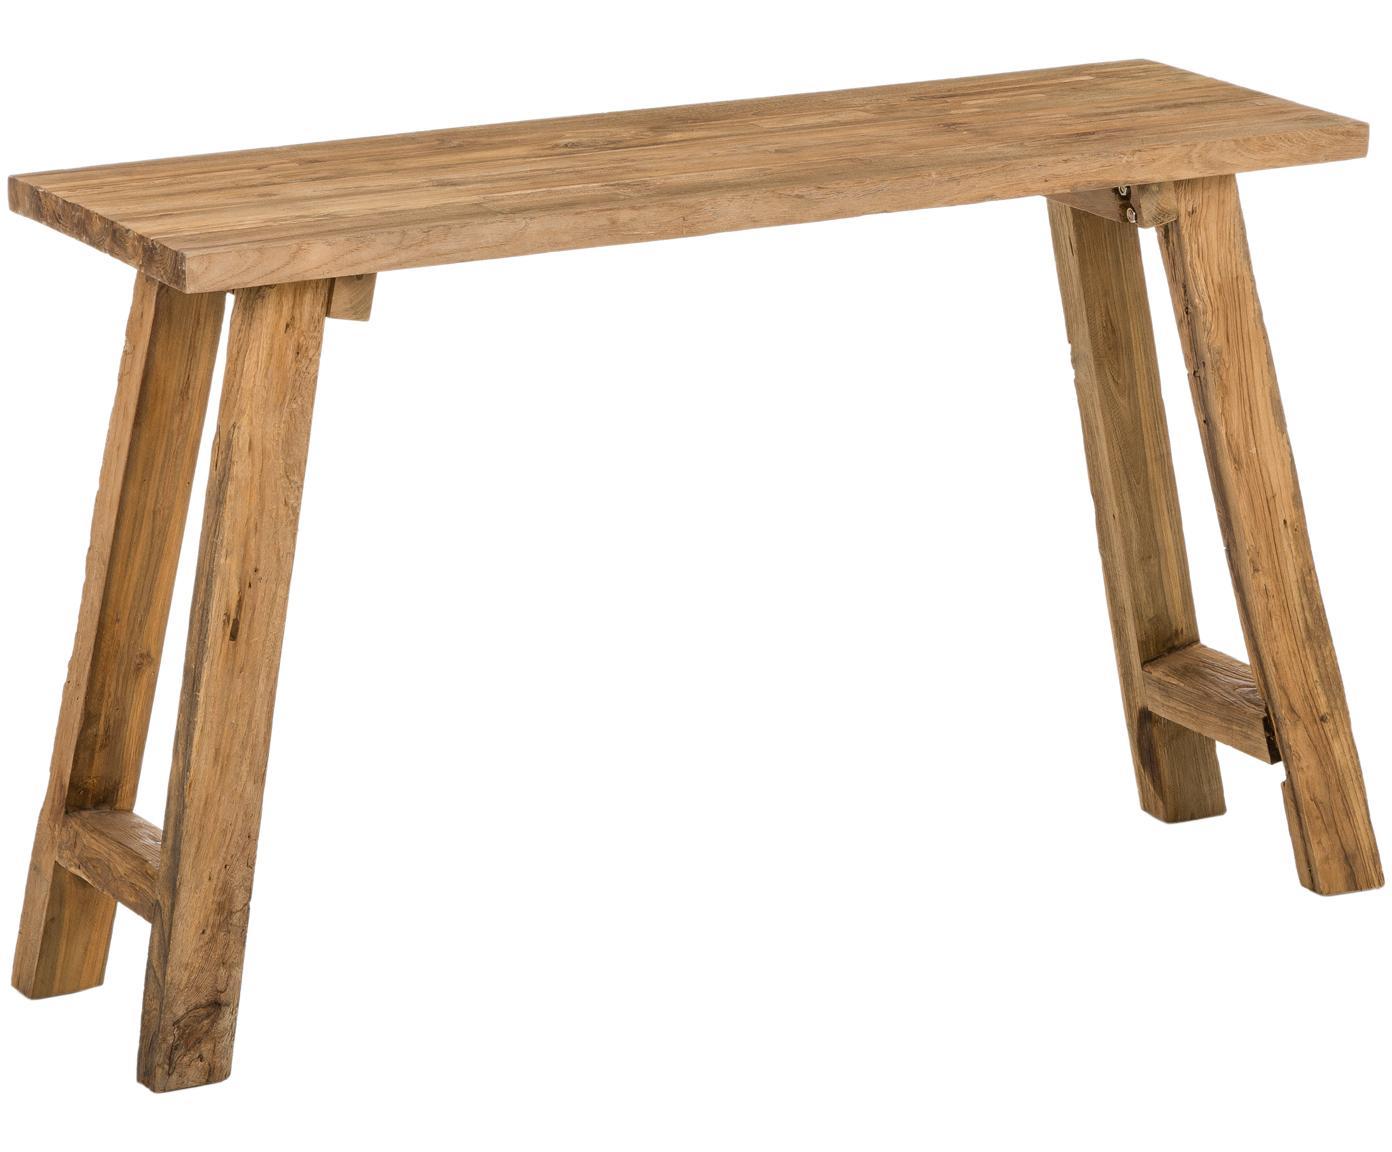 Sidetable Lawas van gerecycled hout, Natuurlijk teakhout, Teakhoutkleurig, B 120 x D 40 cm